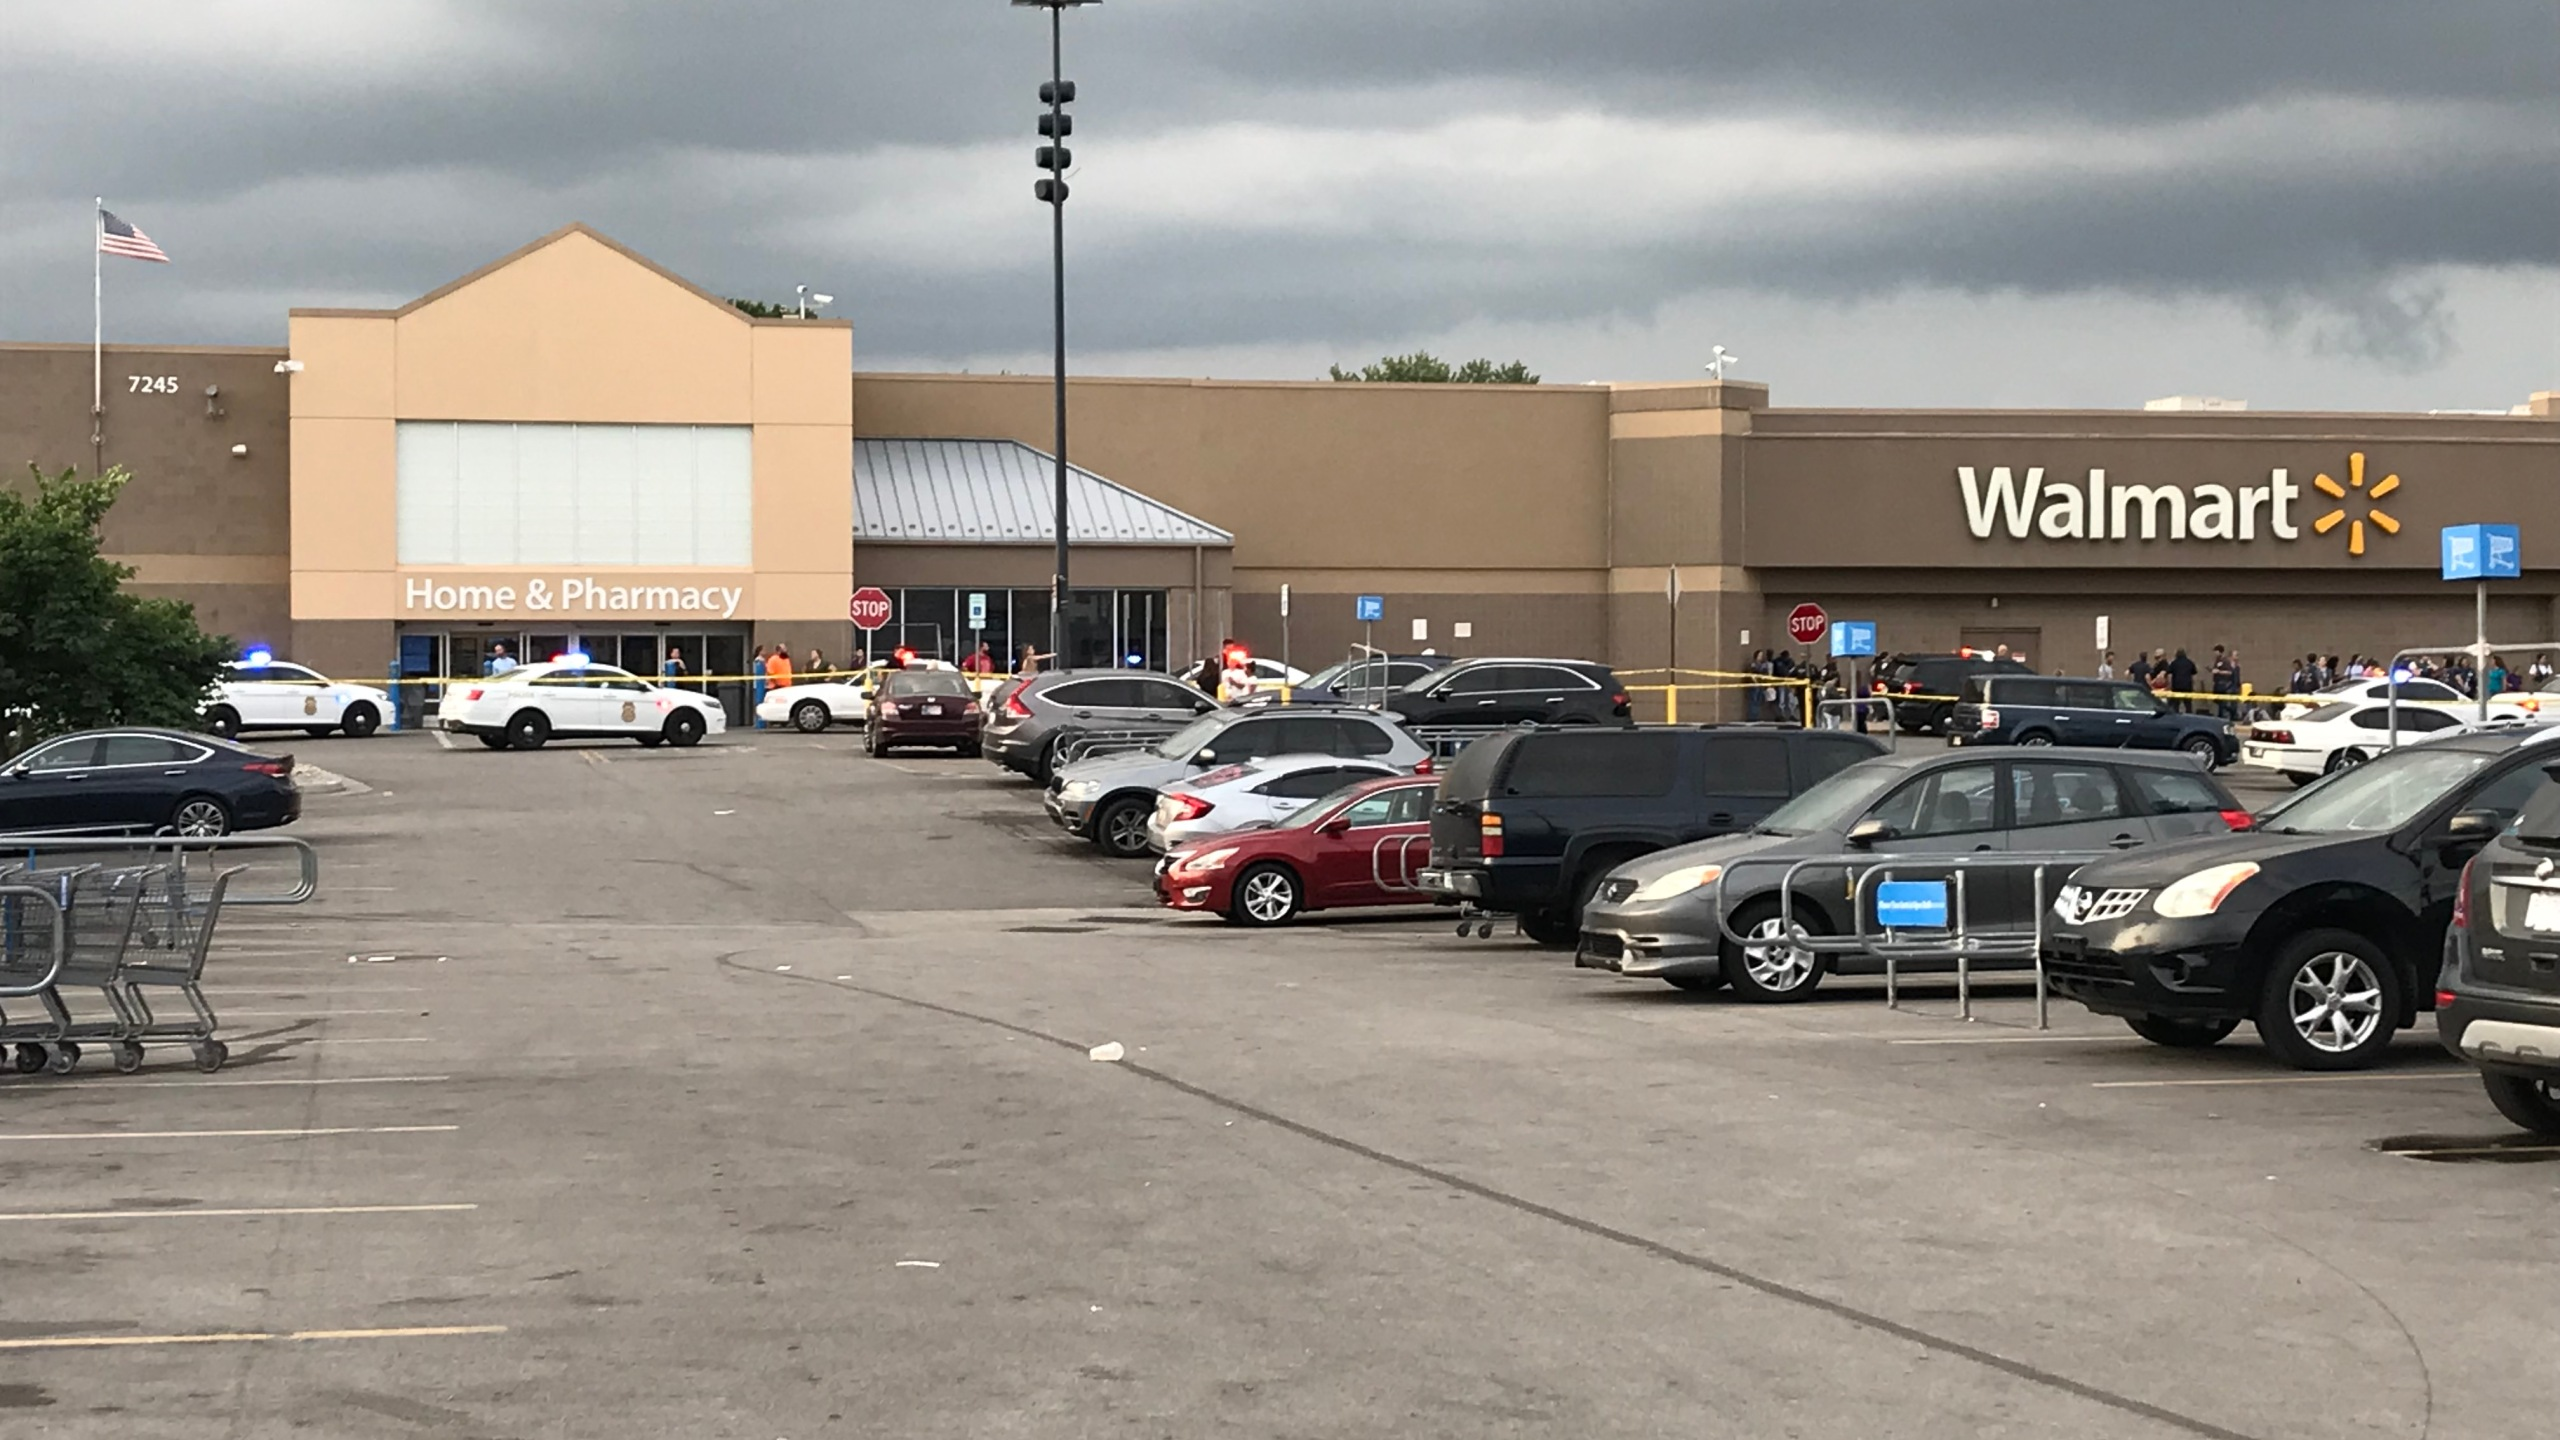 Shots fired inside Walmart